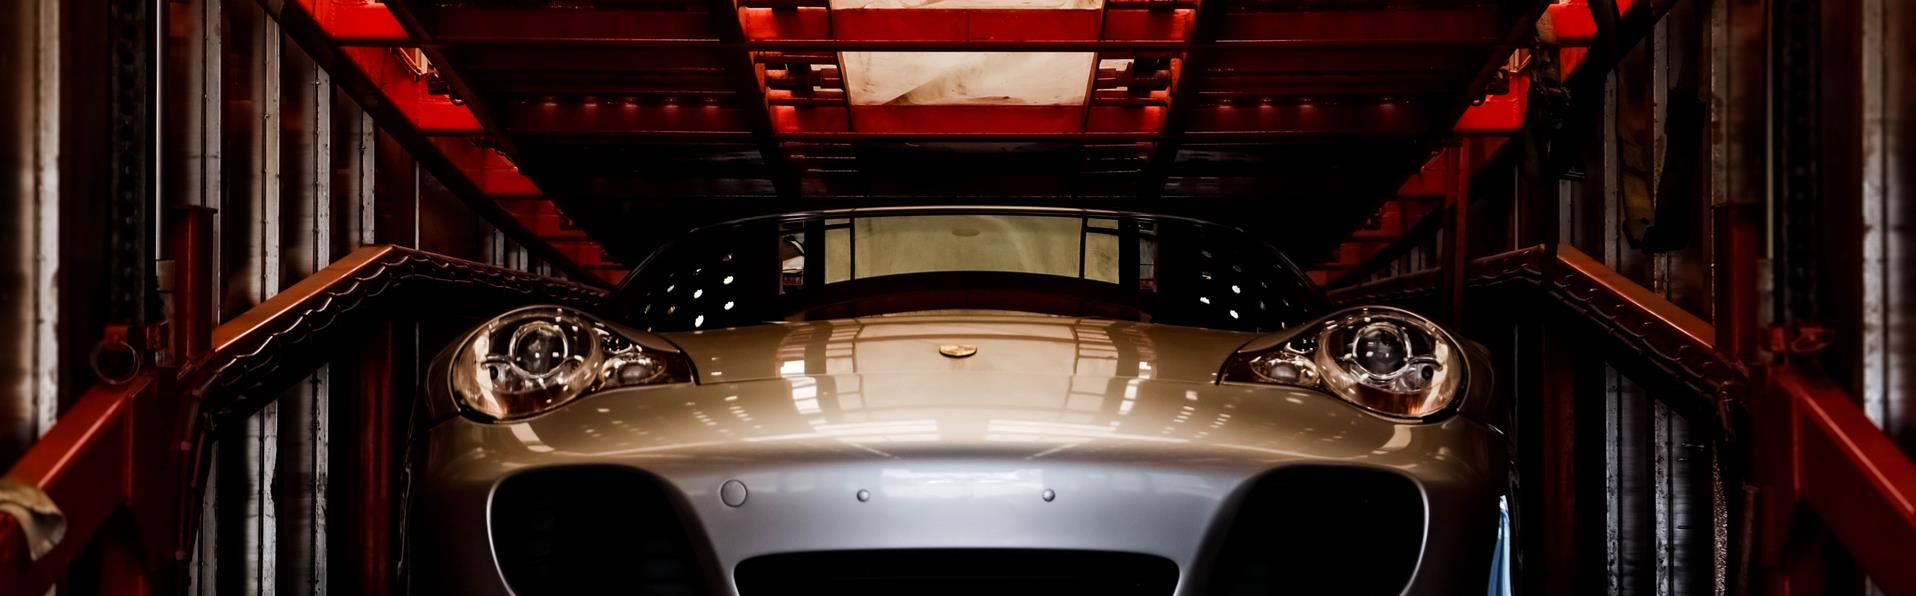 Classic Sports Cars Marina Del Rey CA | Exotic & Collectible